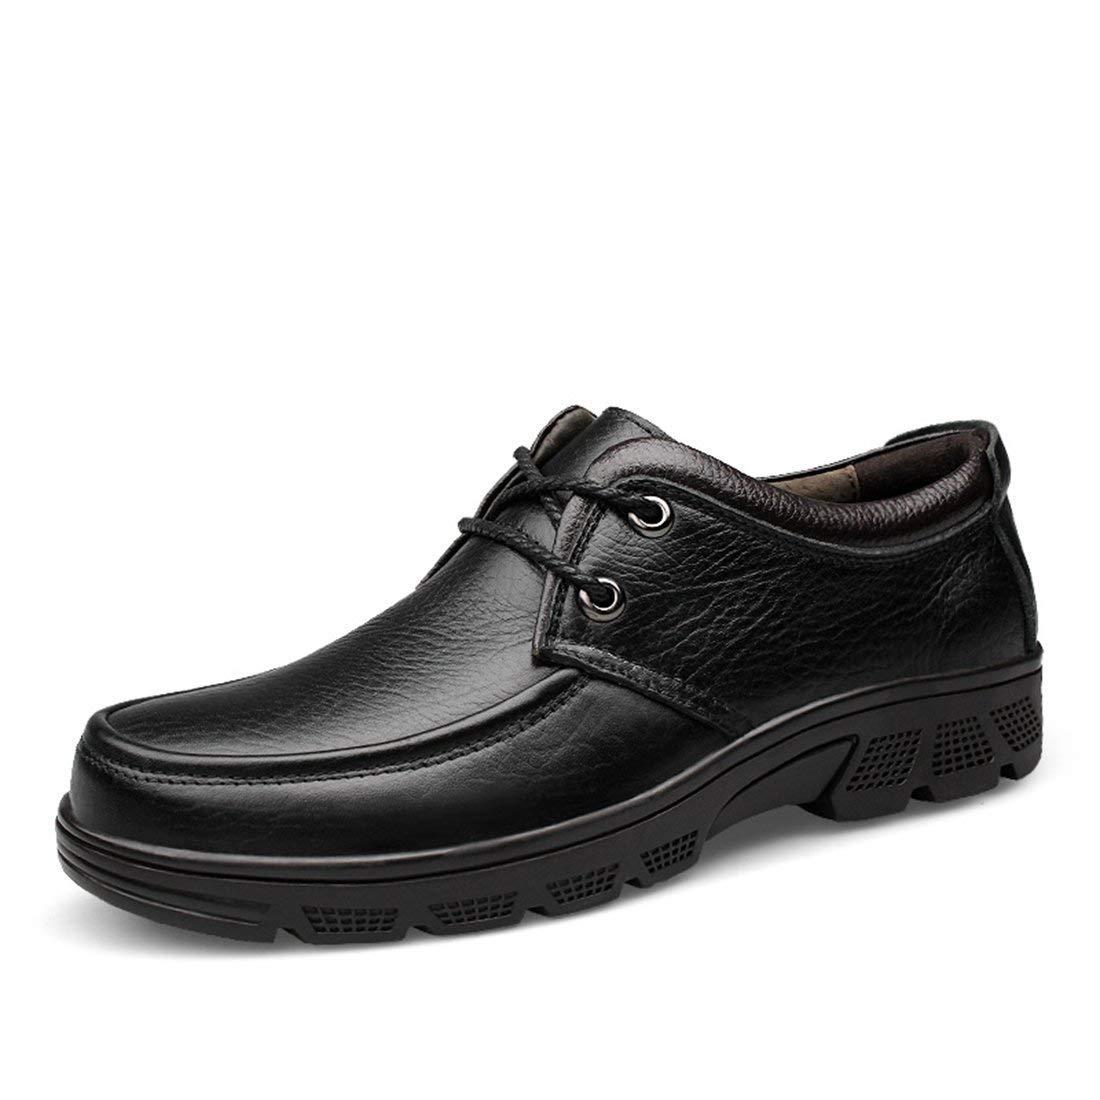 Herren Retro Casual Street Walking Schuhe (Farbe   Schwarz, Größe   5 UK)